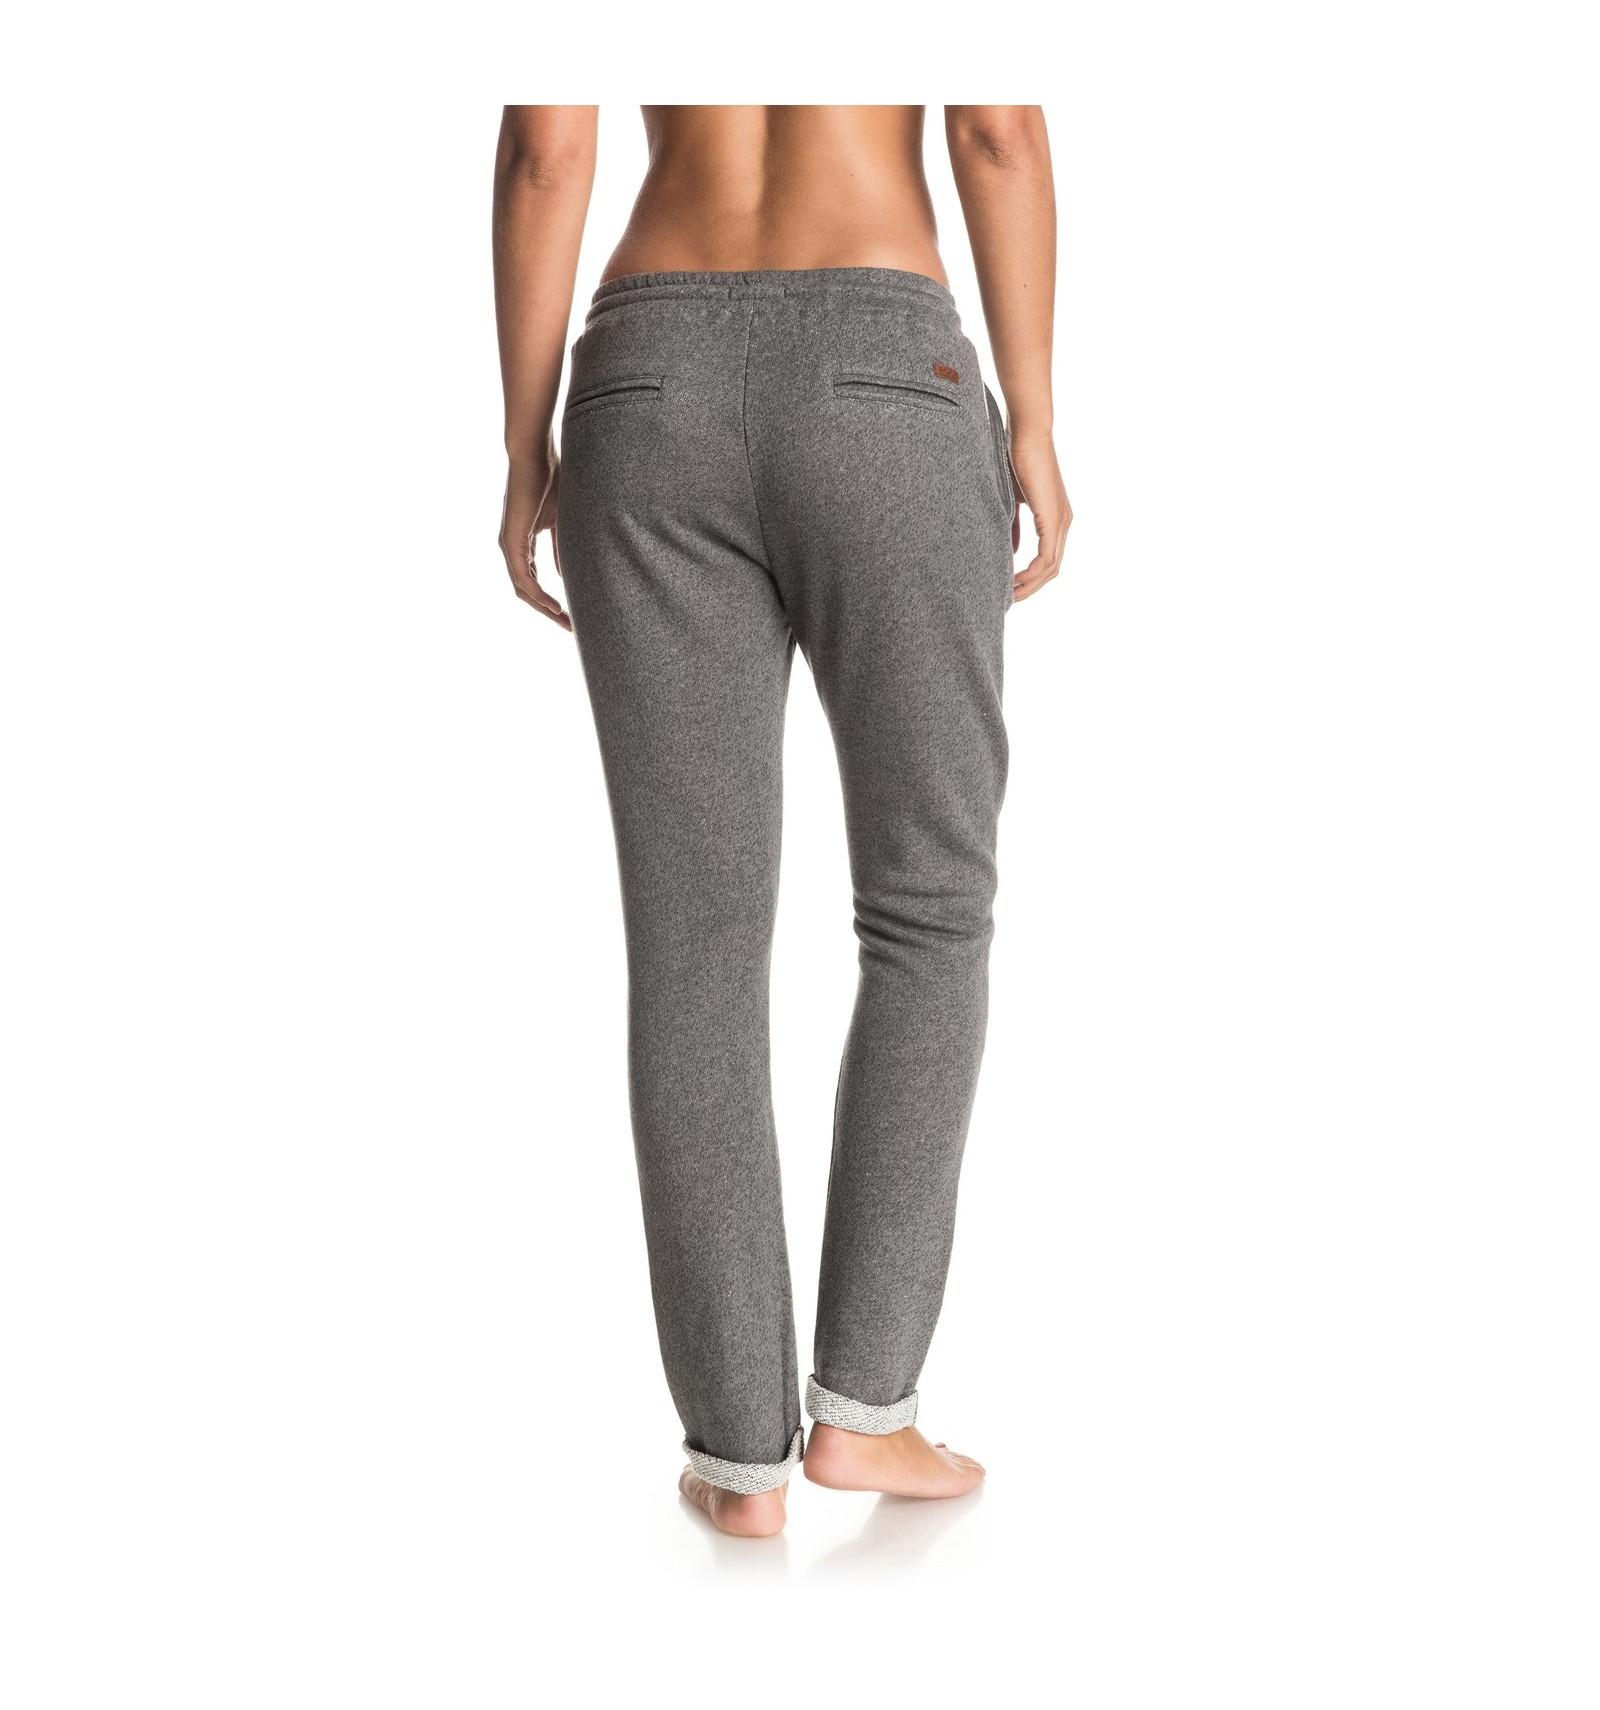 520d5921b8f Pantalon de chandal ROXY mujer - Vicunasport - Tu tienda de deportes ...